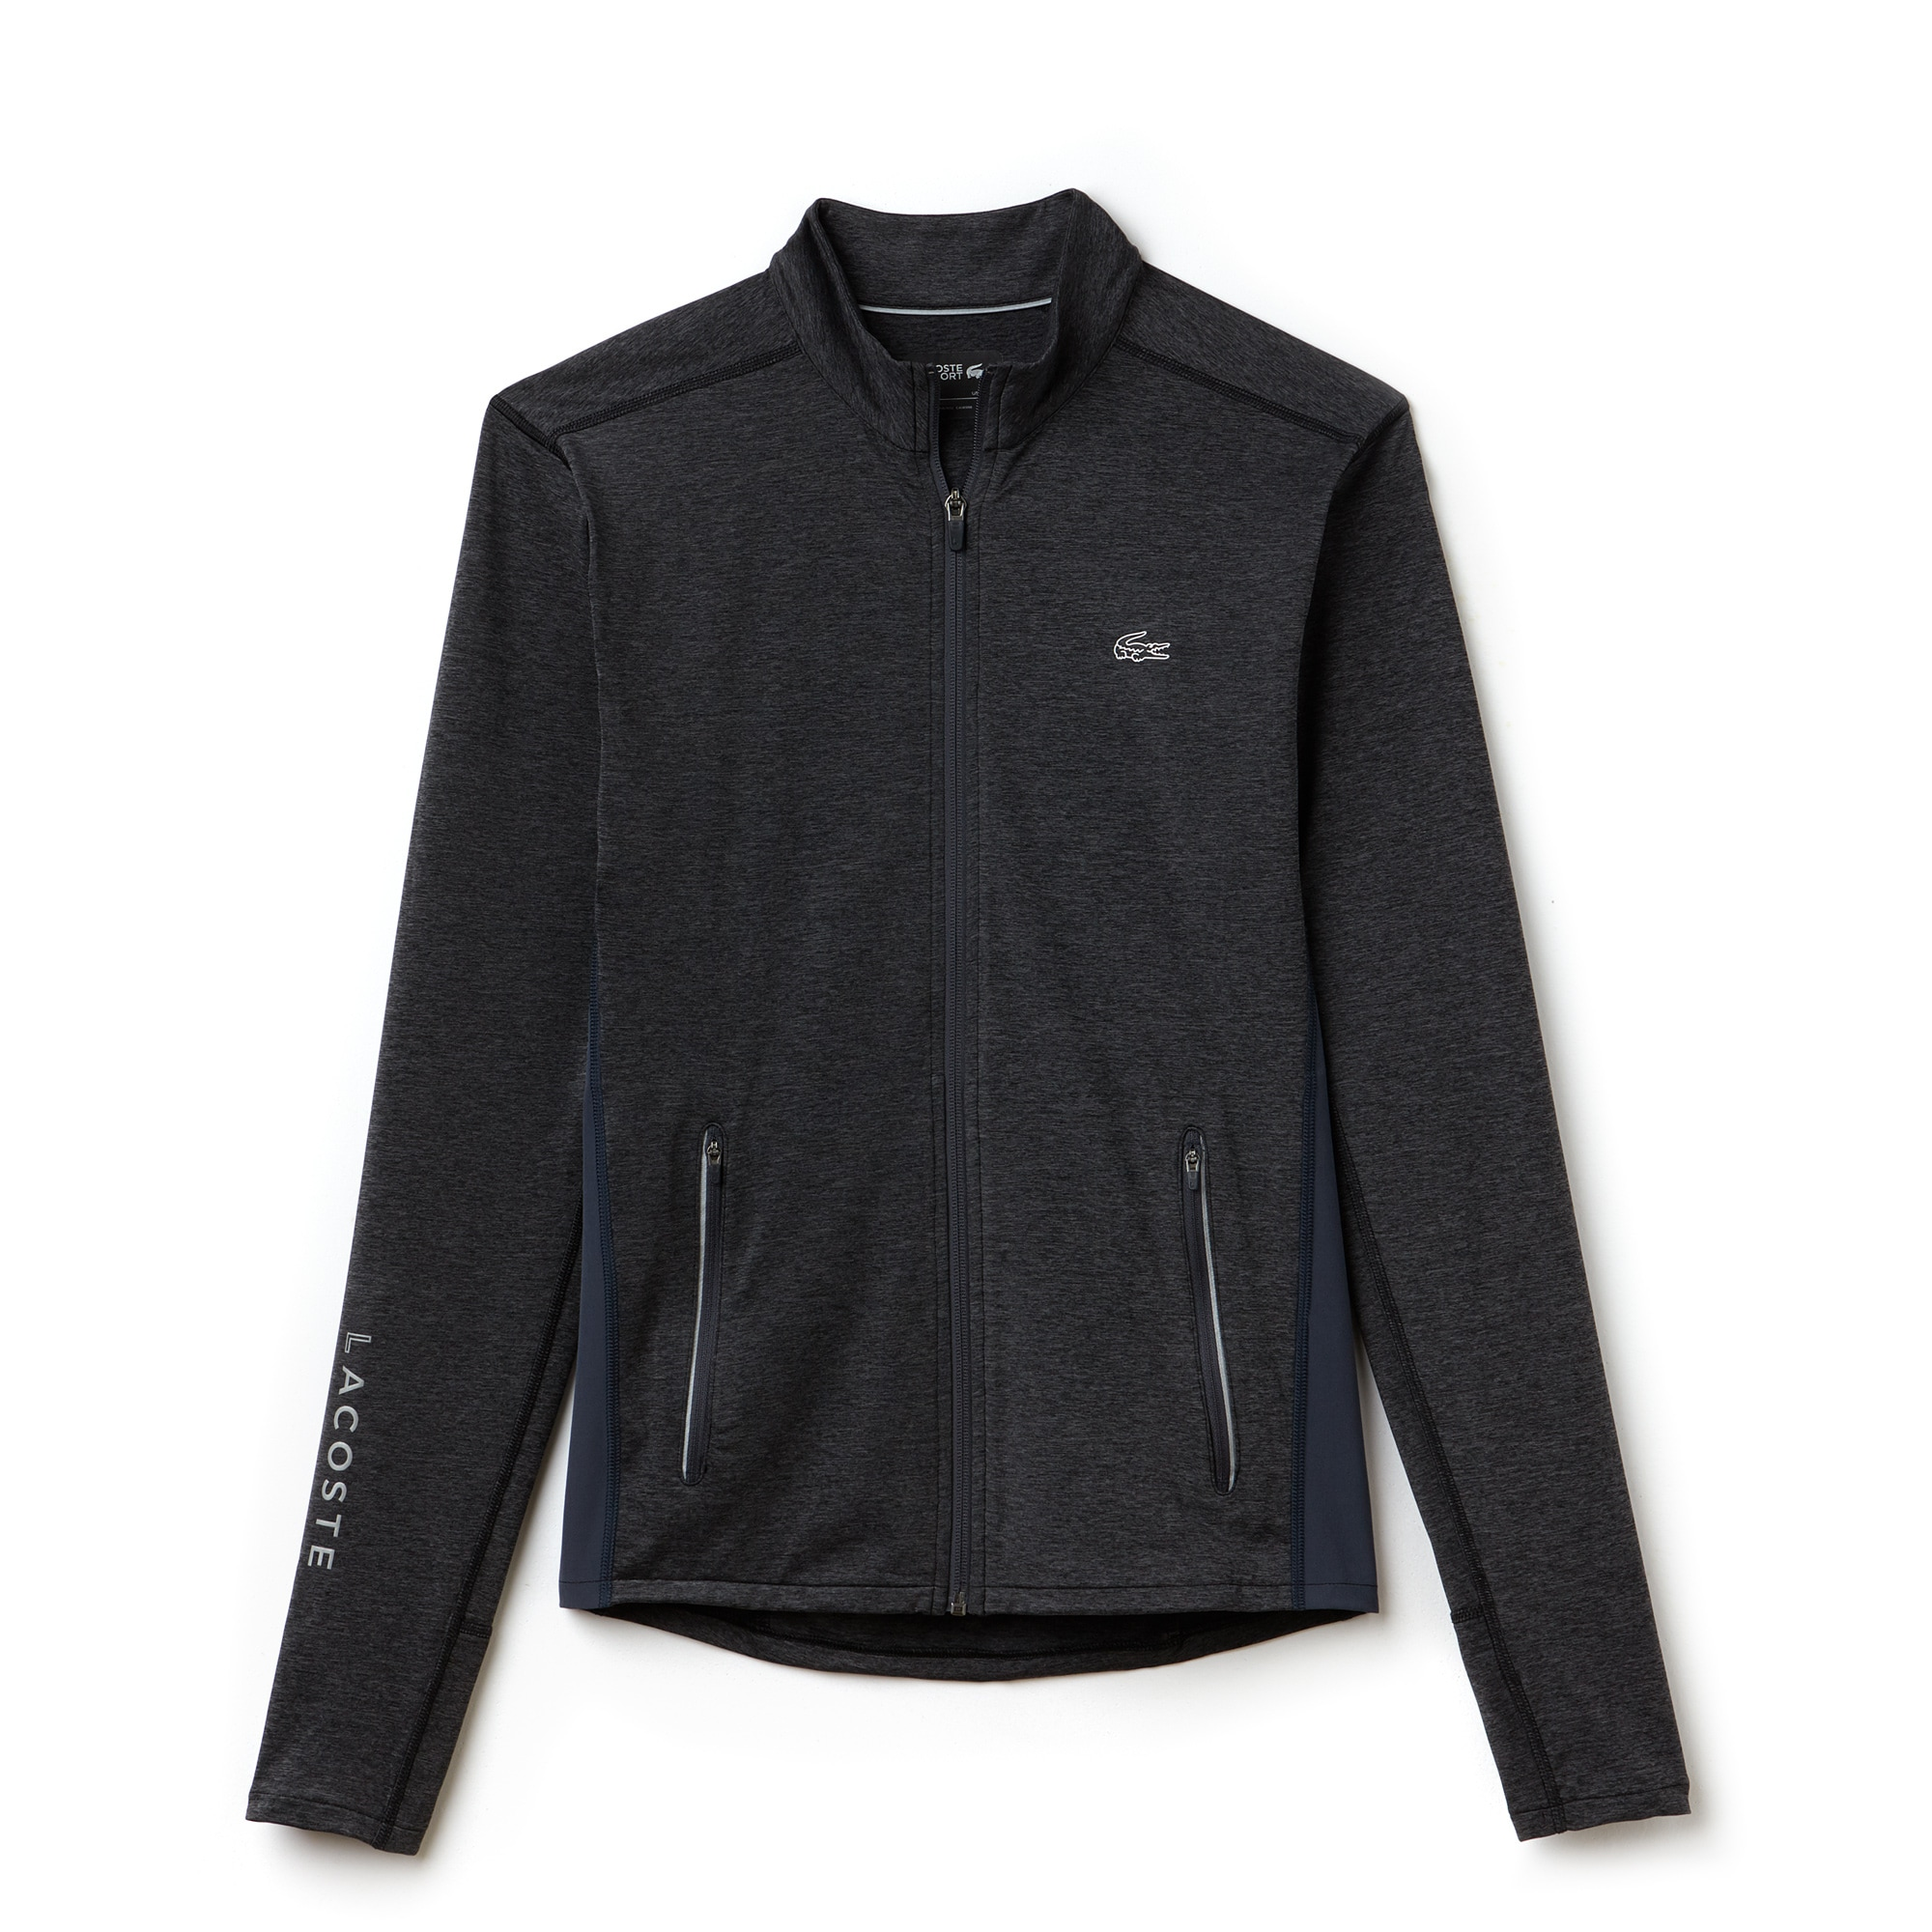 Men's Lacoste SPORT Tennis Zippered Stretch Jersey Sweatshirt